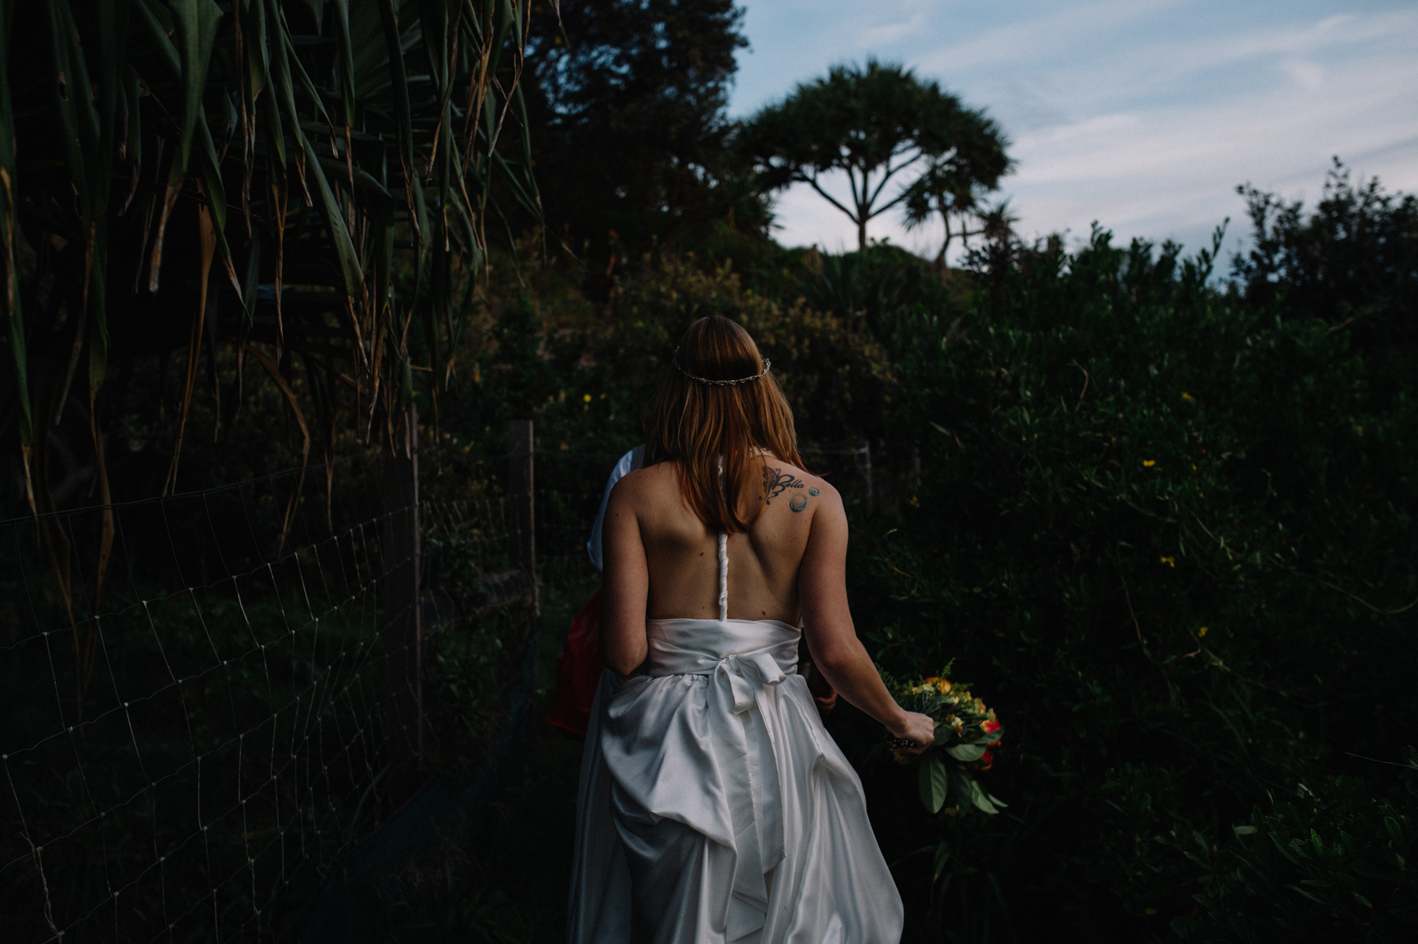 001-jewli-joshu-trash-the-dress_sophie-baker-photography